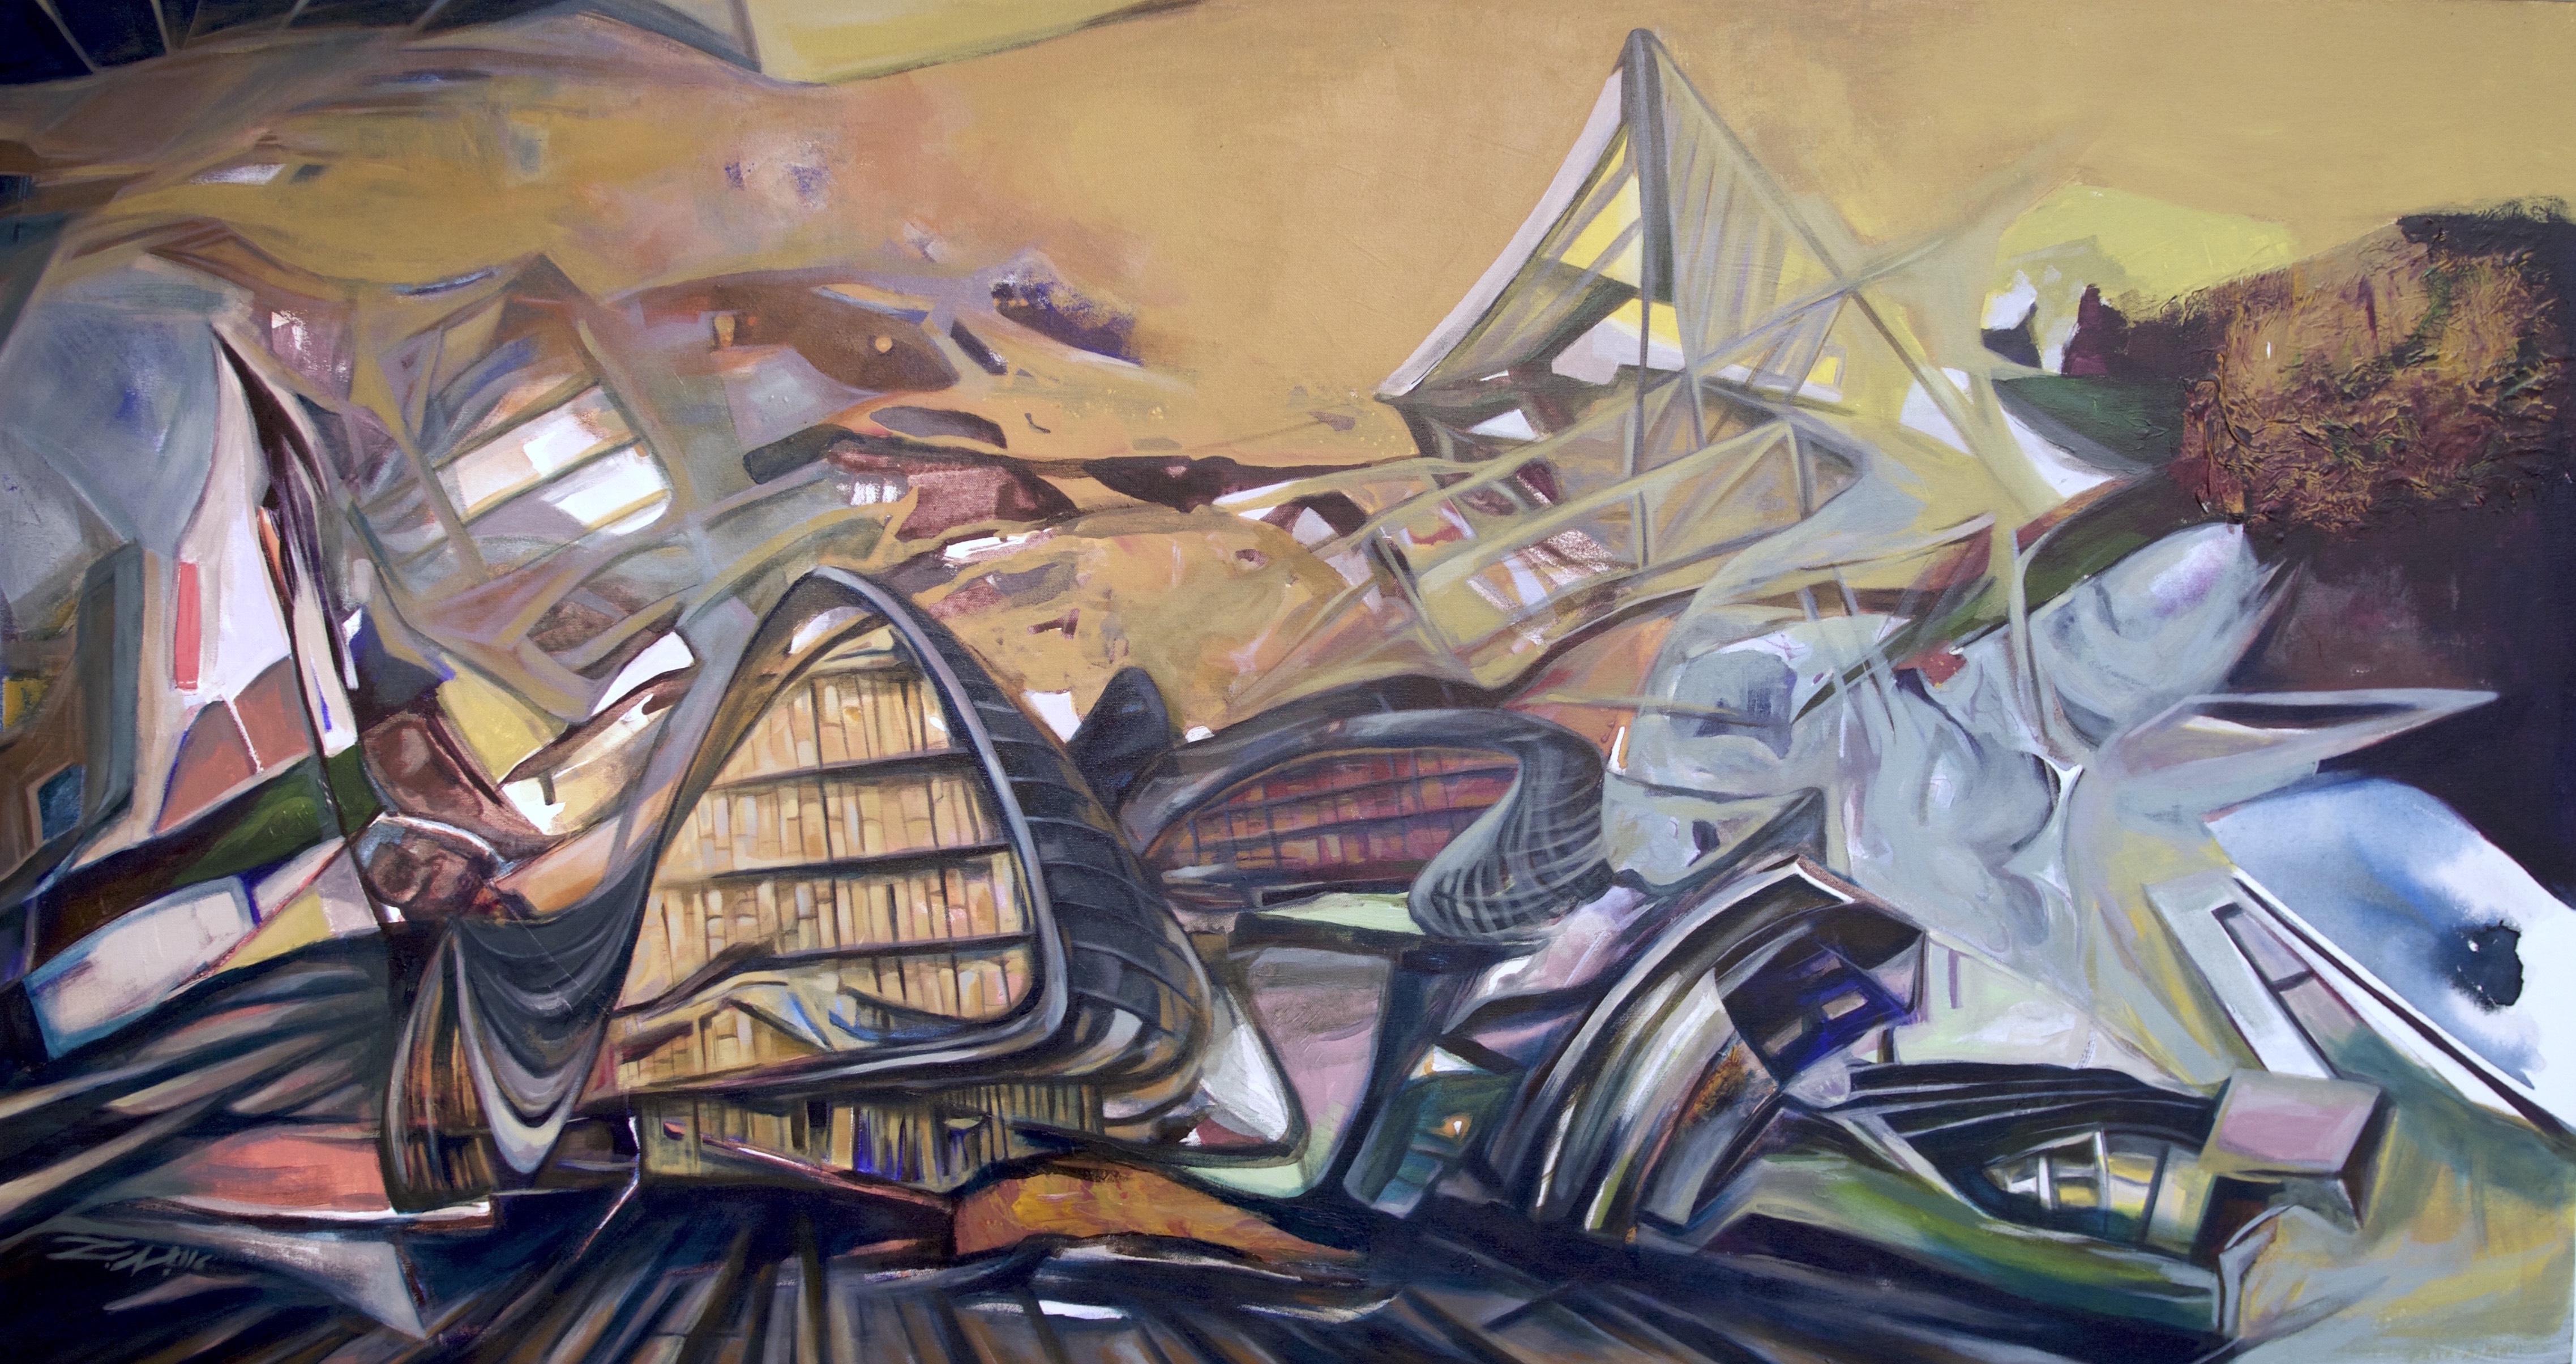 Urban Landscape, acrylic on canvas 36x68 inches, 2016